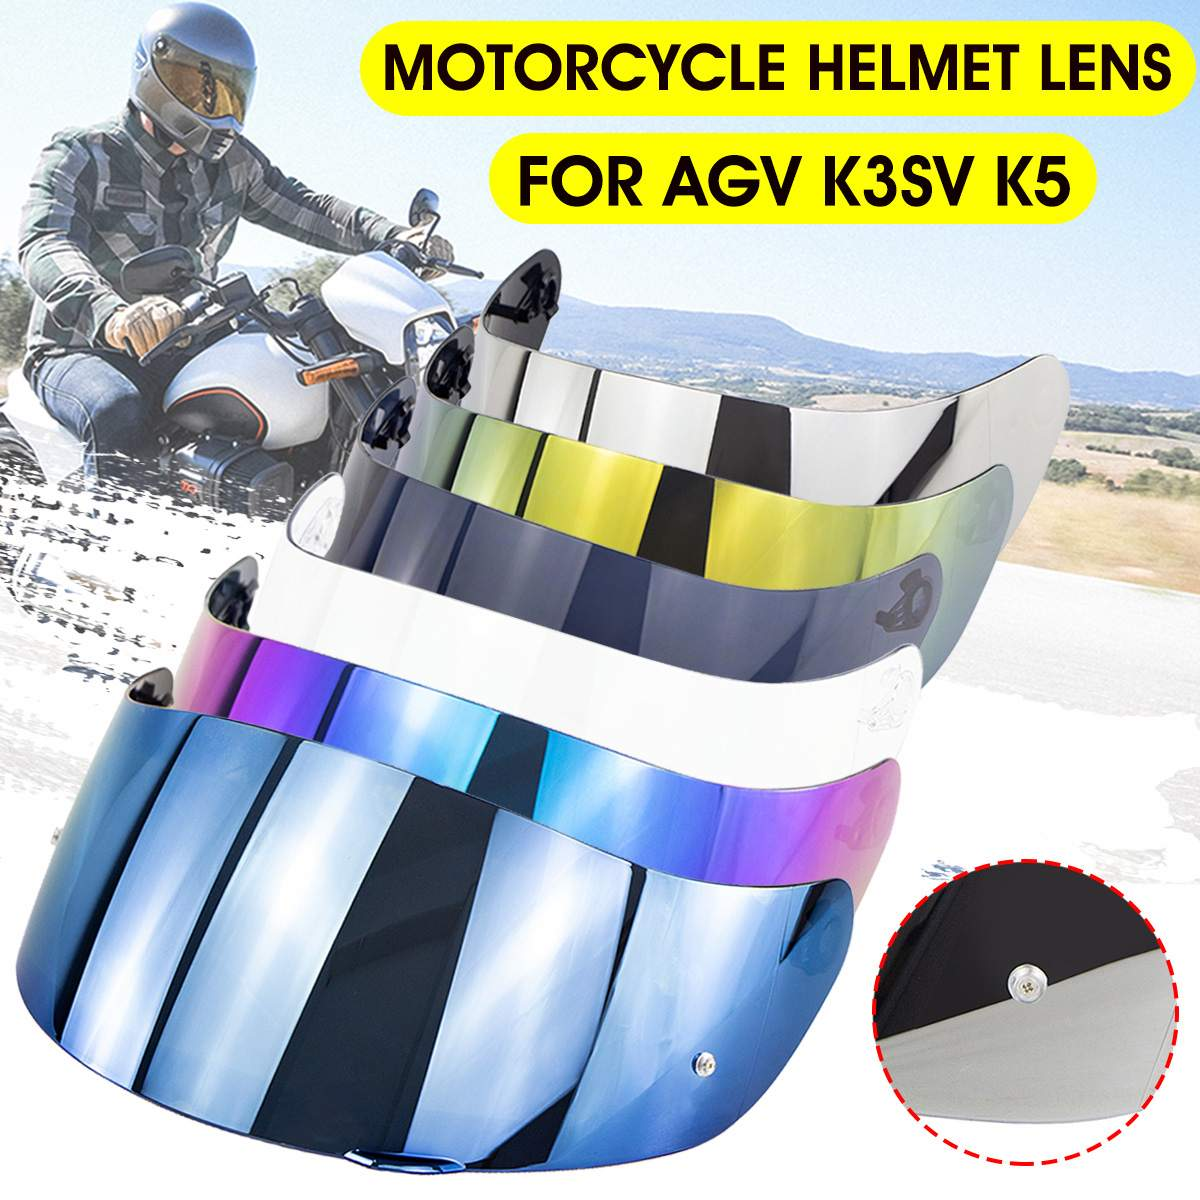 Rosto cheio da motocicleta capacete lente viseira para agv k3sv k5 motocross capacetes viseira óculos de lente com pino bloqueio